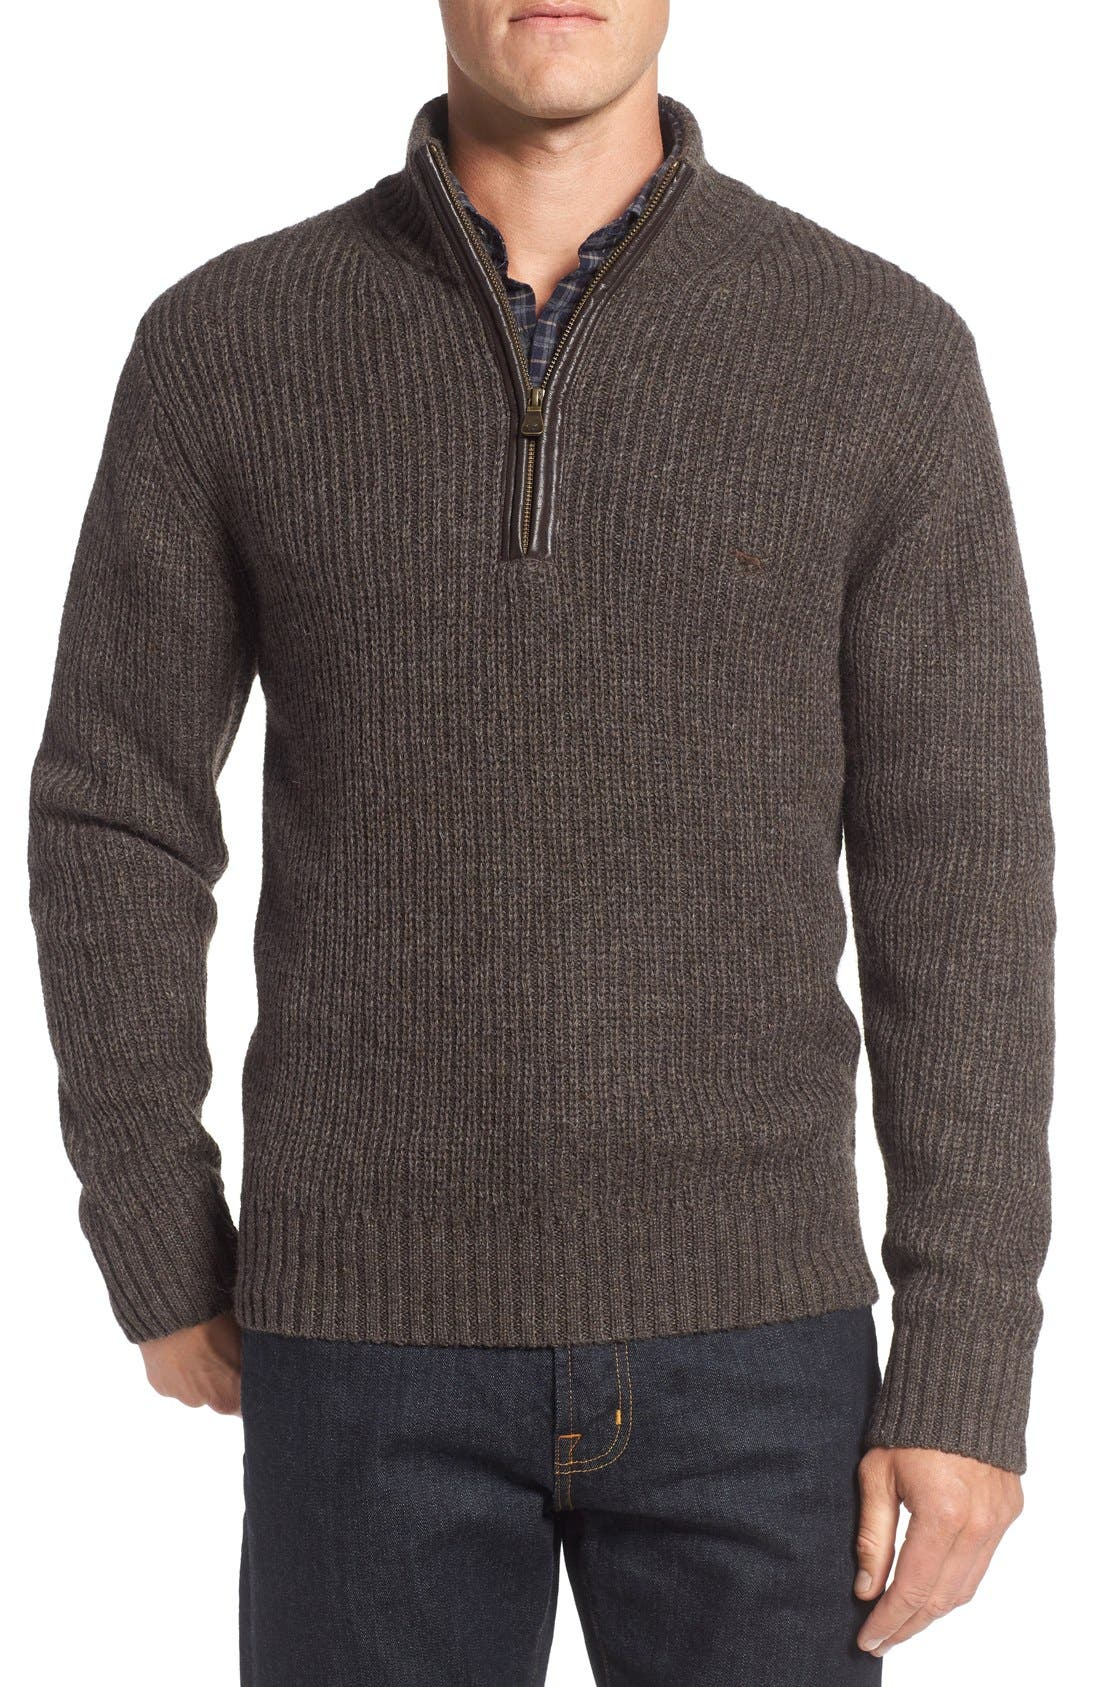 'Huka Lodge' Merino Wool Blend Quarter Zip Sweater,                         Main,                         color, Dirt